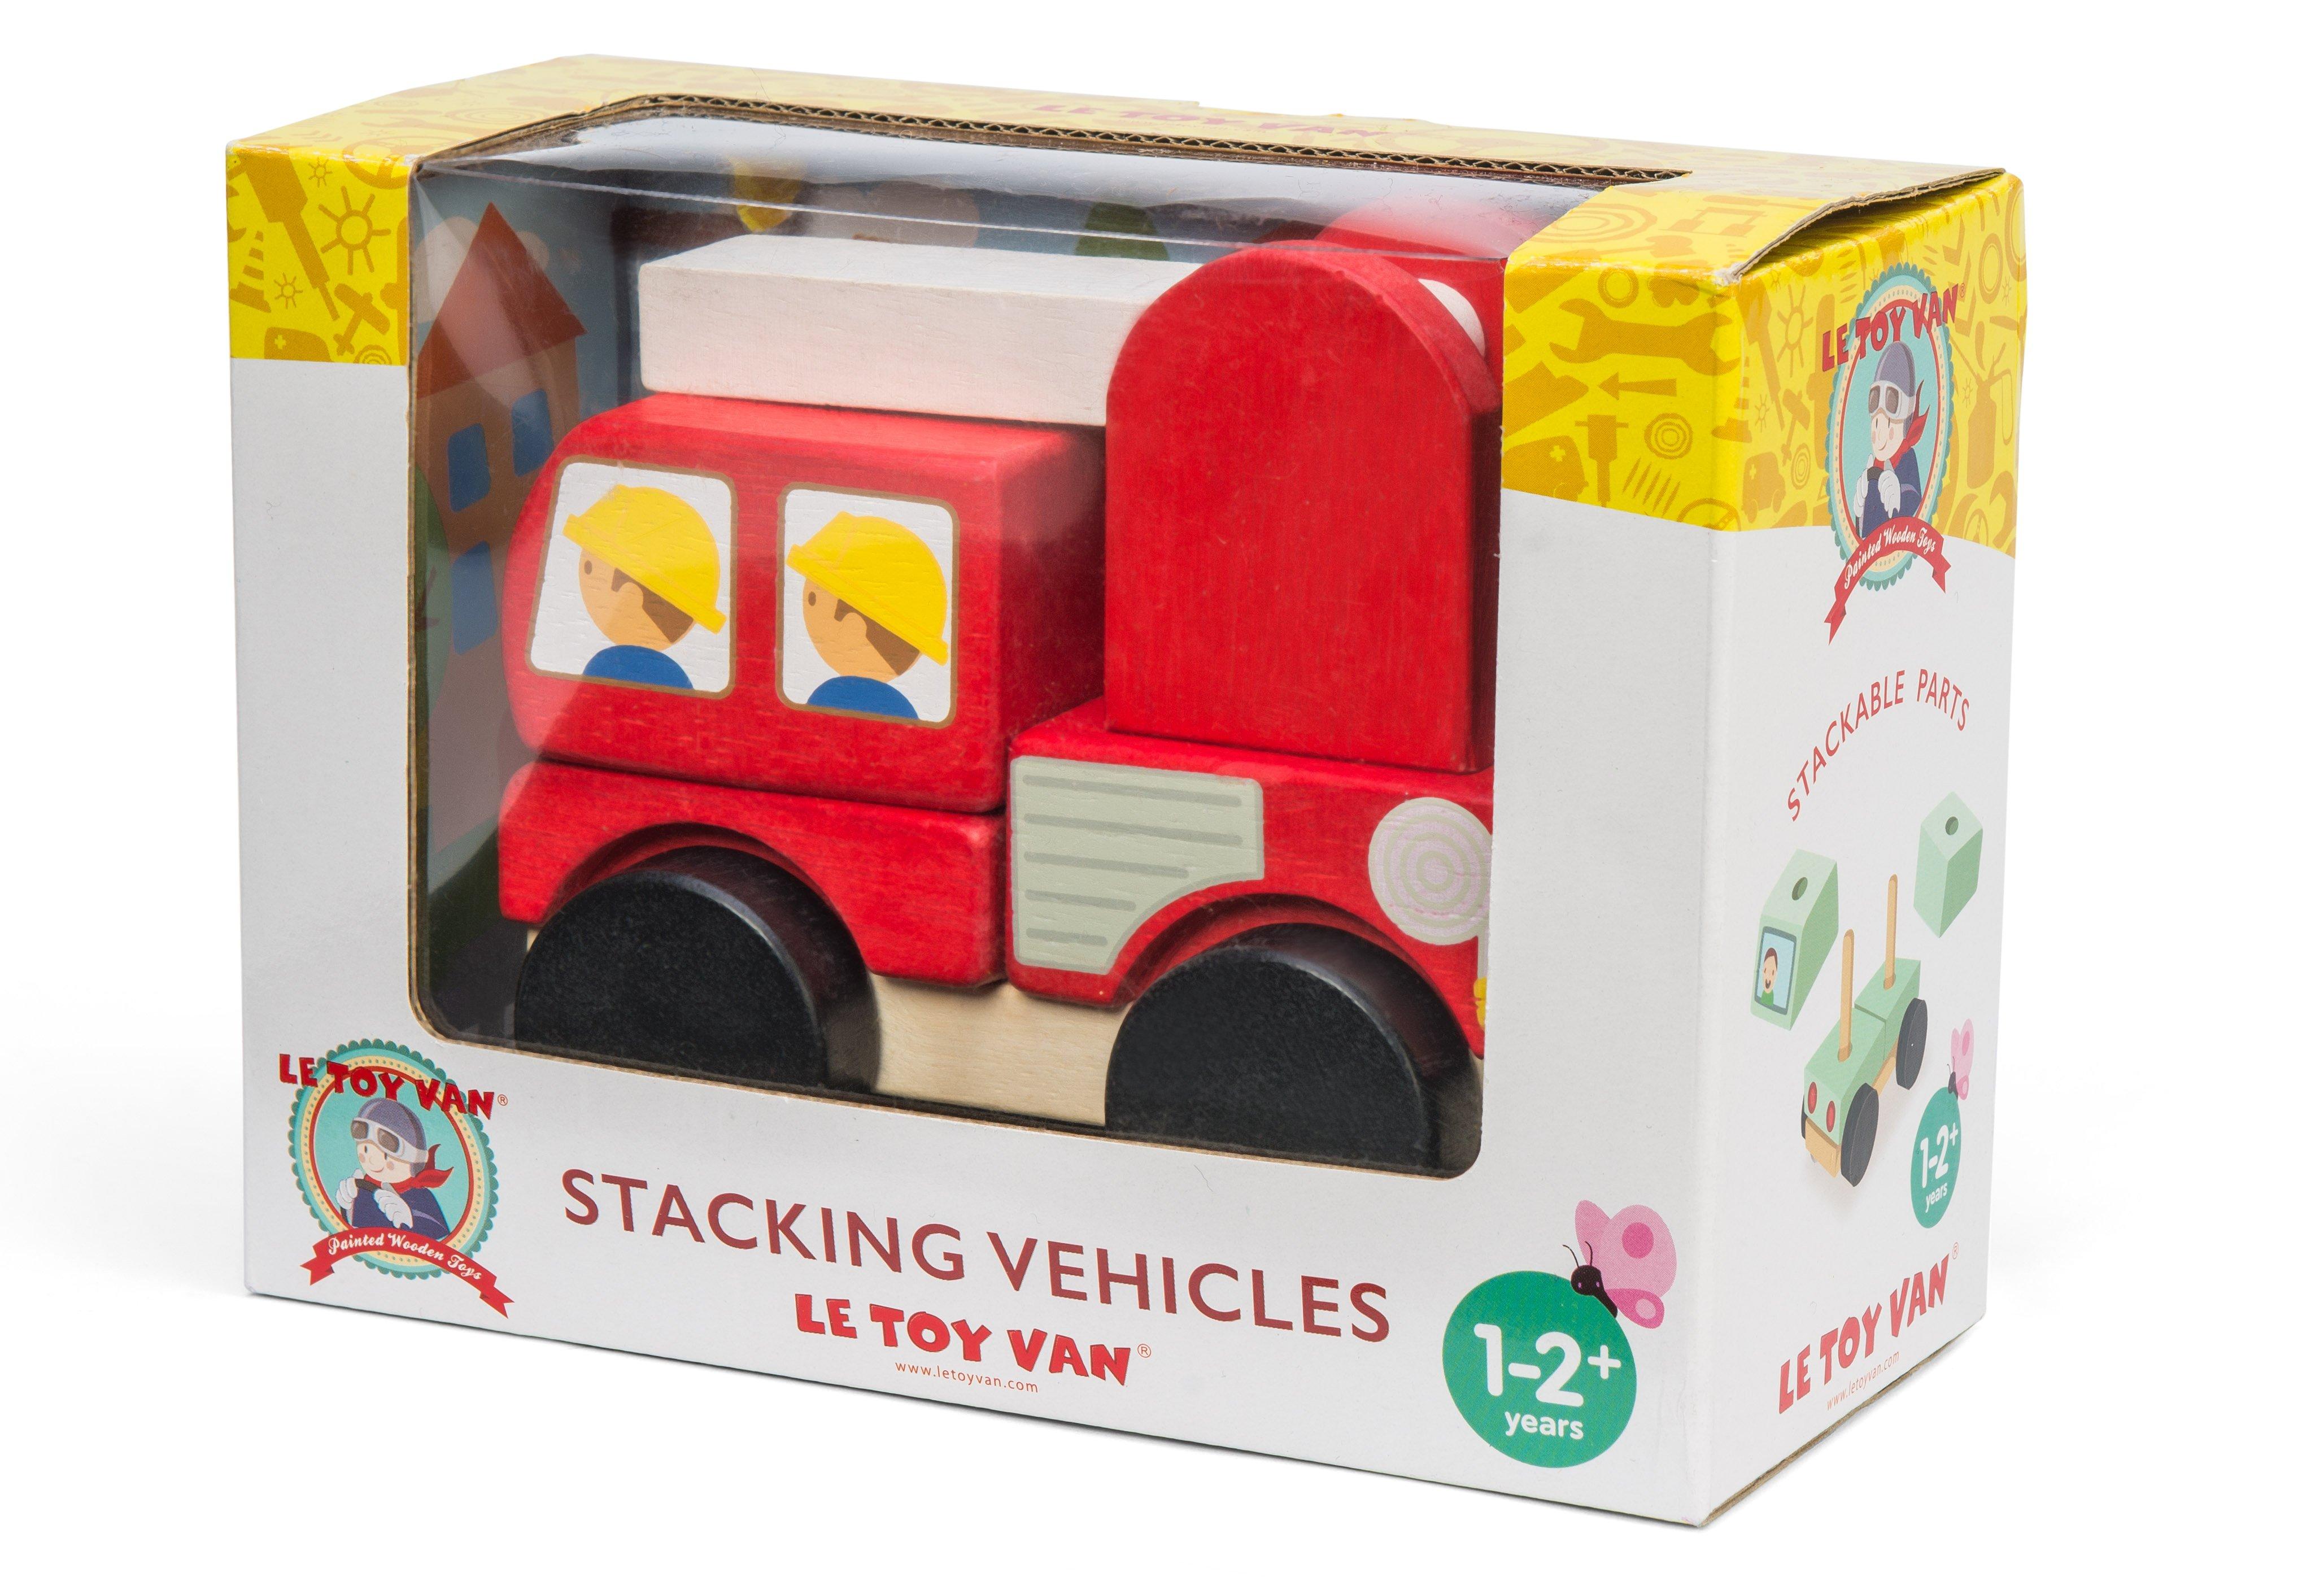 Toy van photo